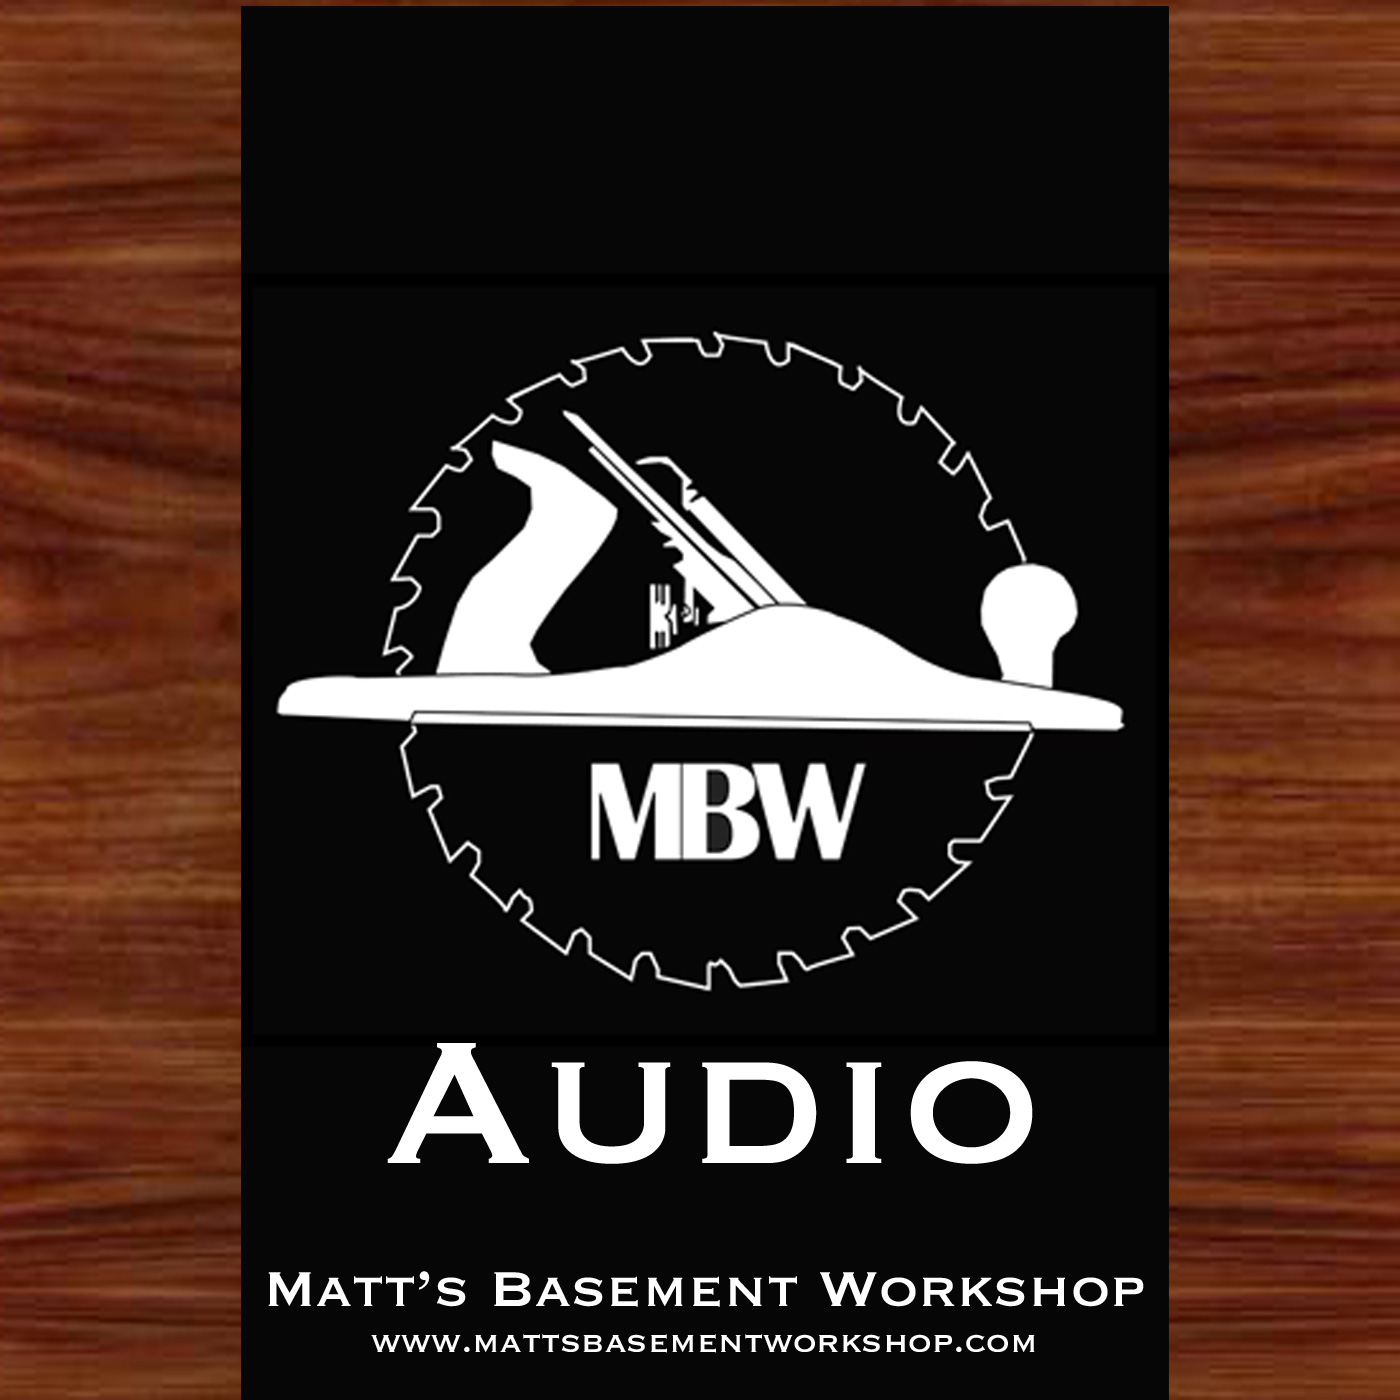 Matt's Basement Workshop - Audio